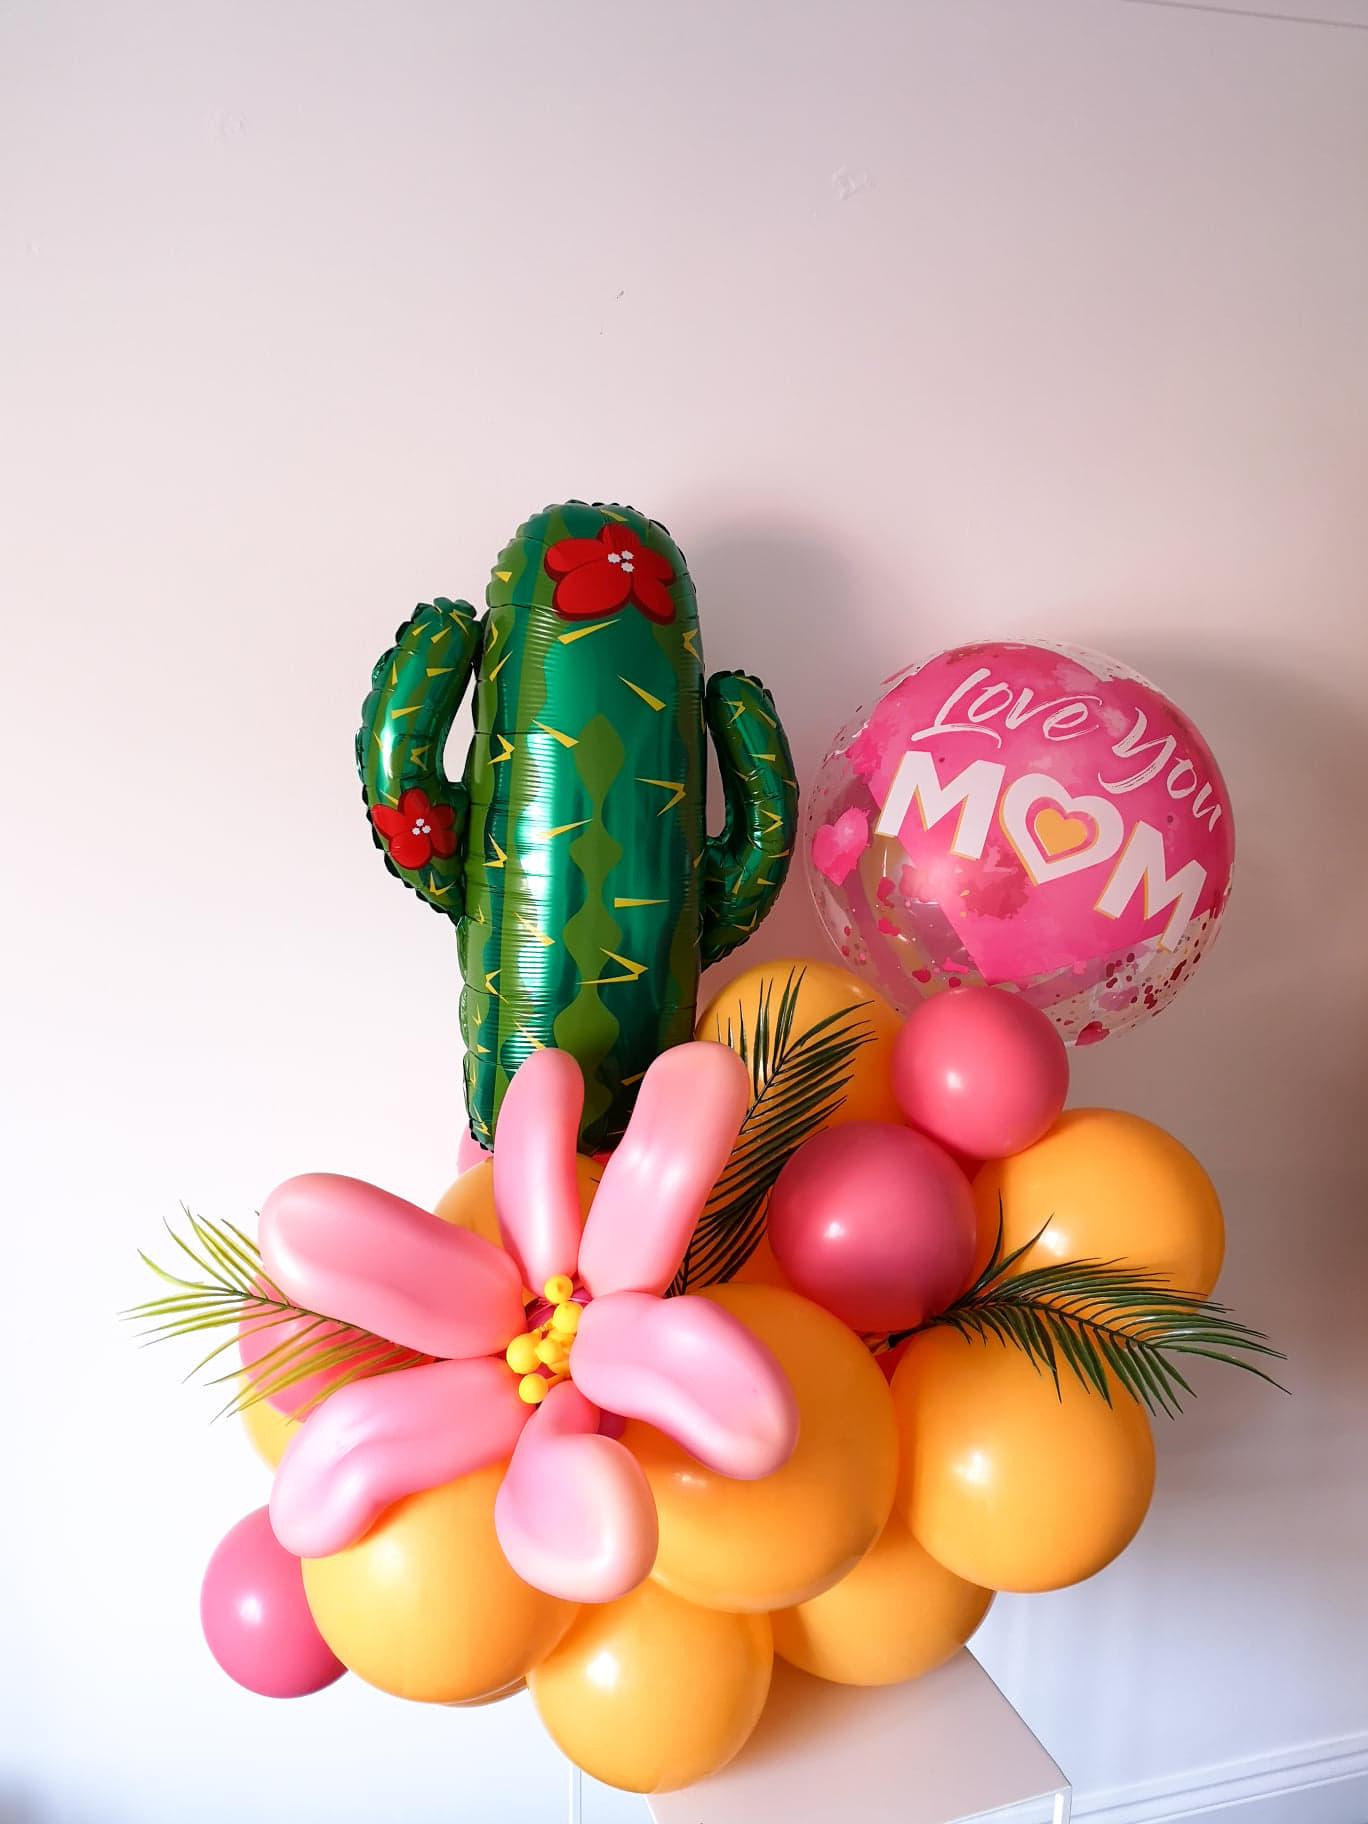 Love you Mum balloons